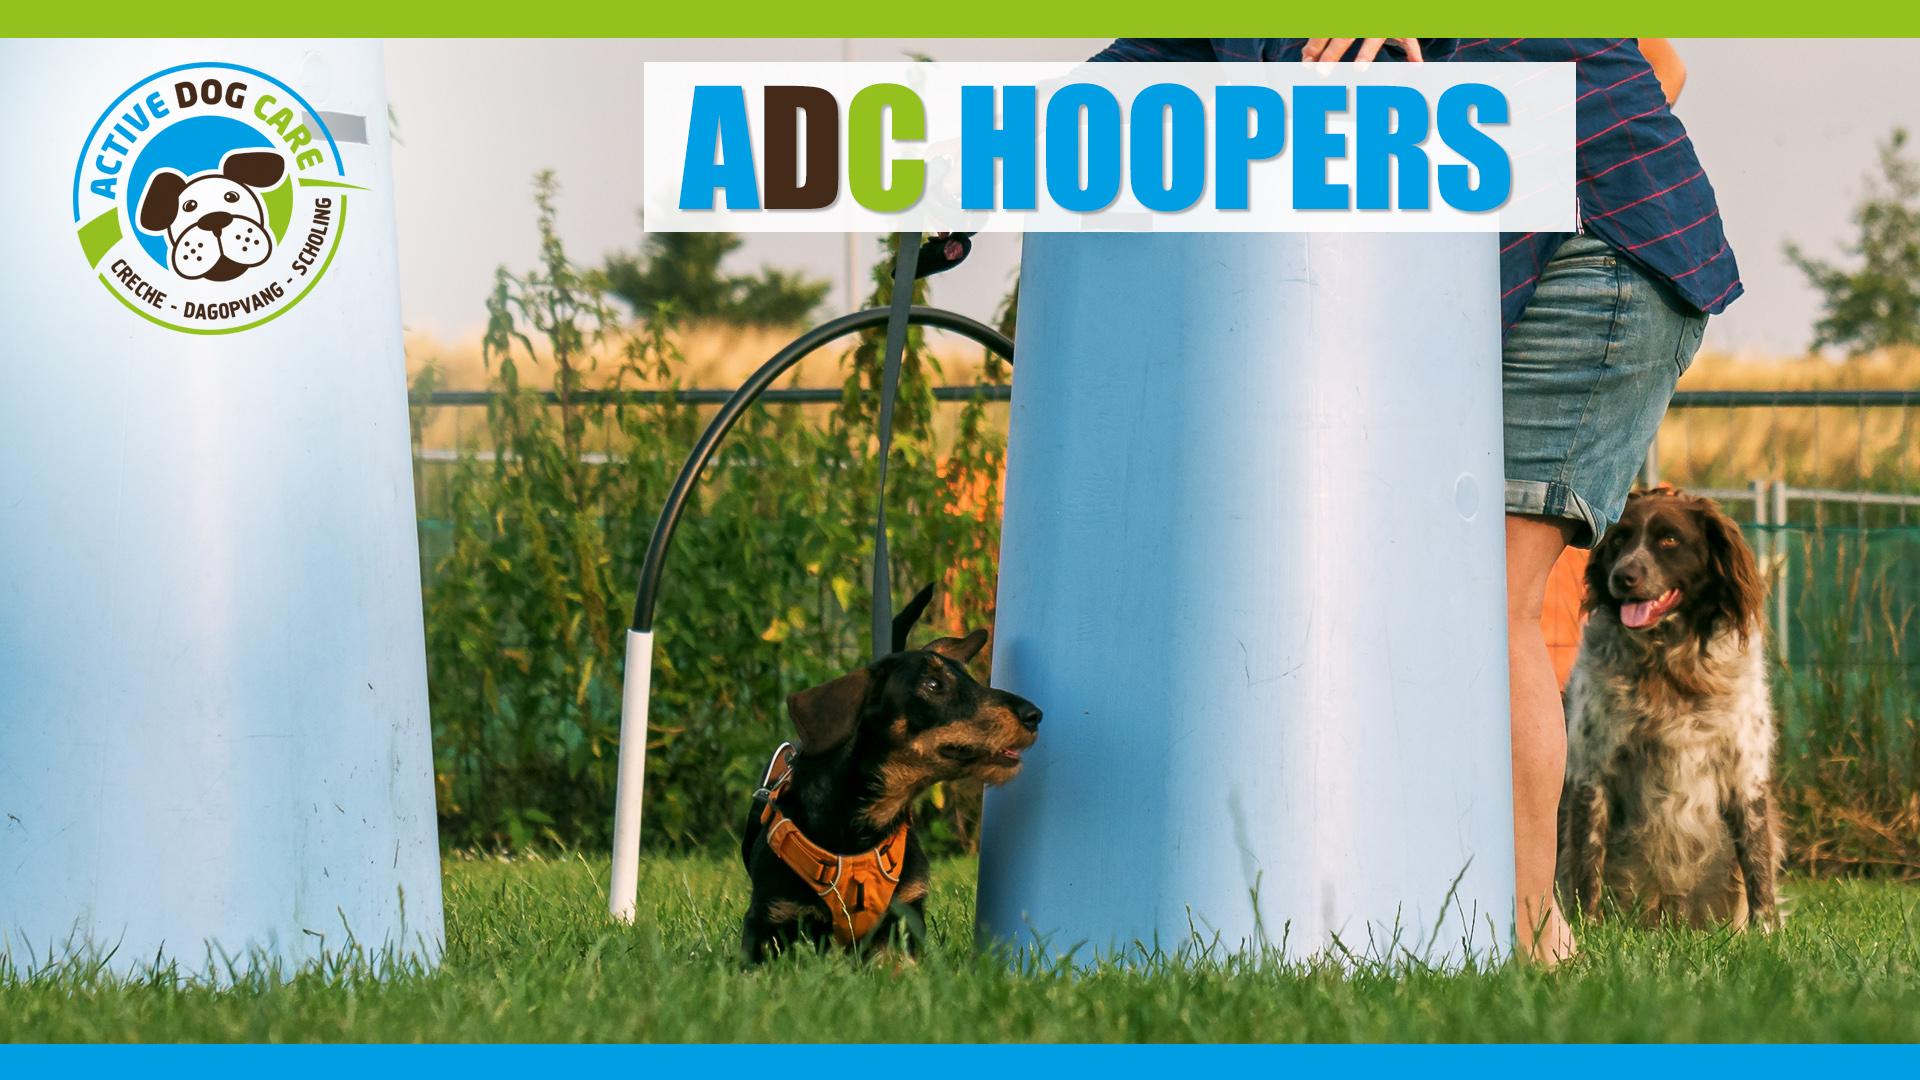 ADC hoopers